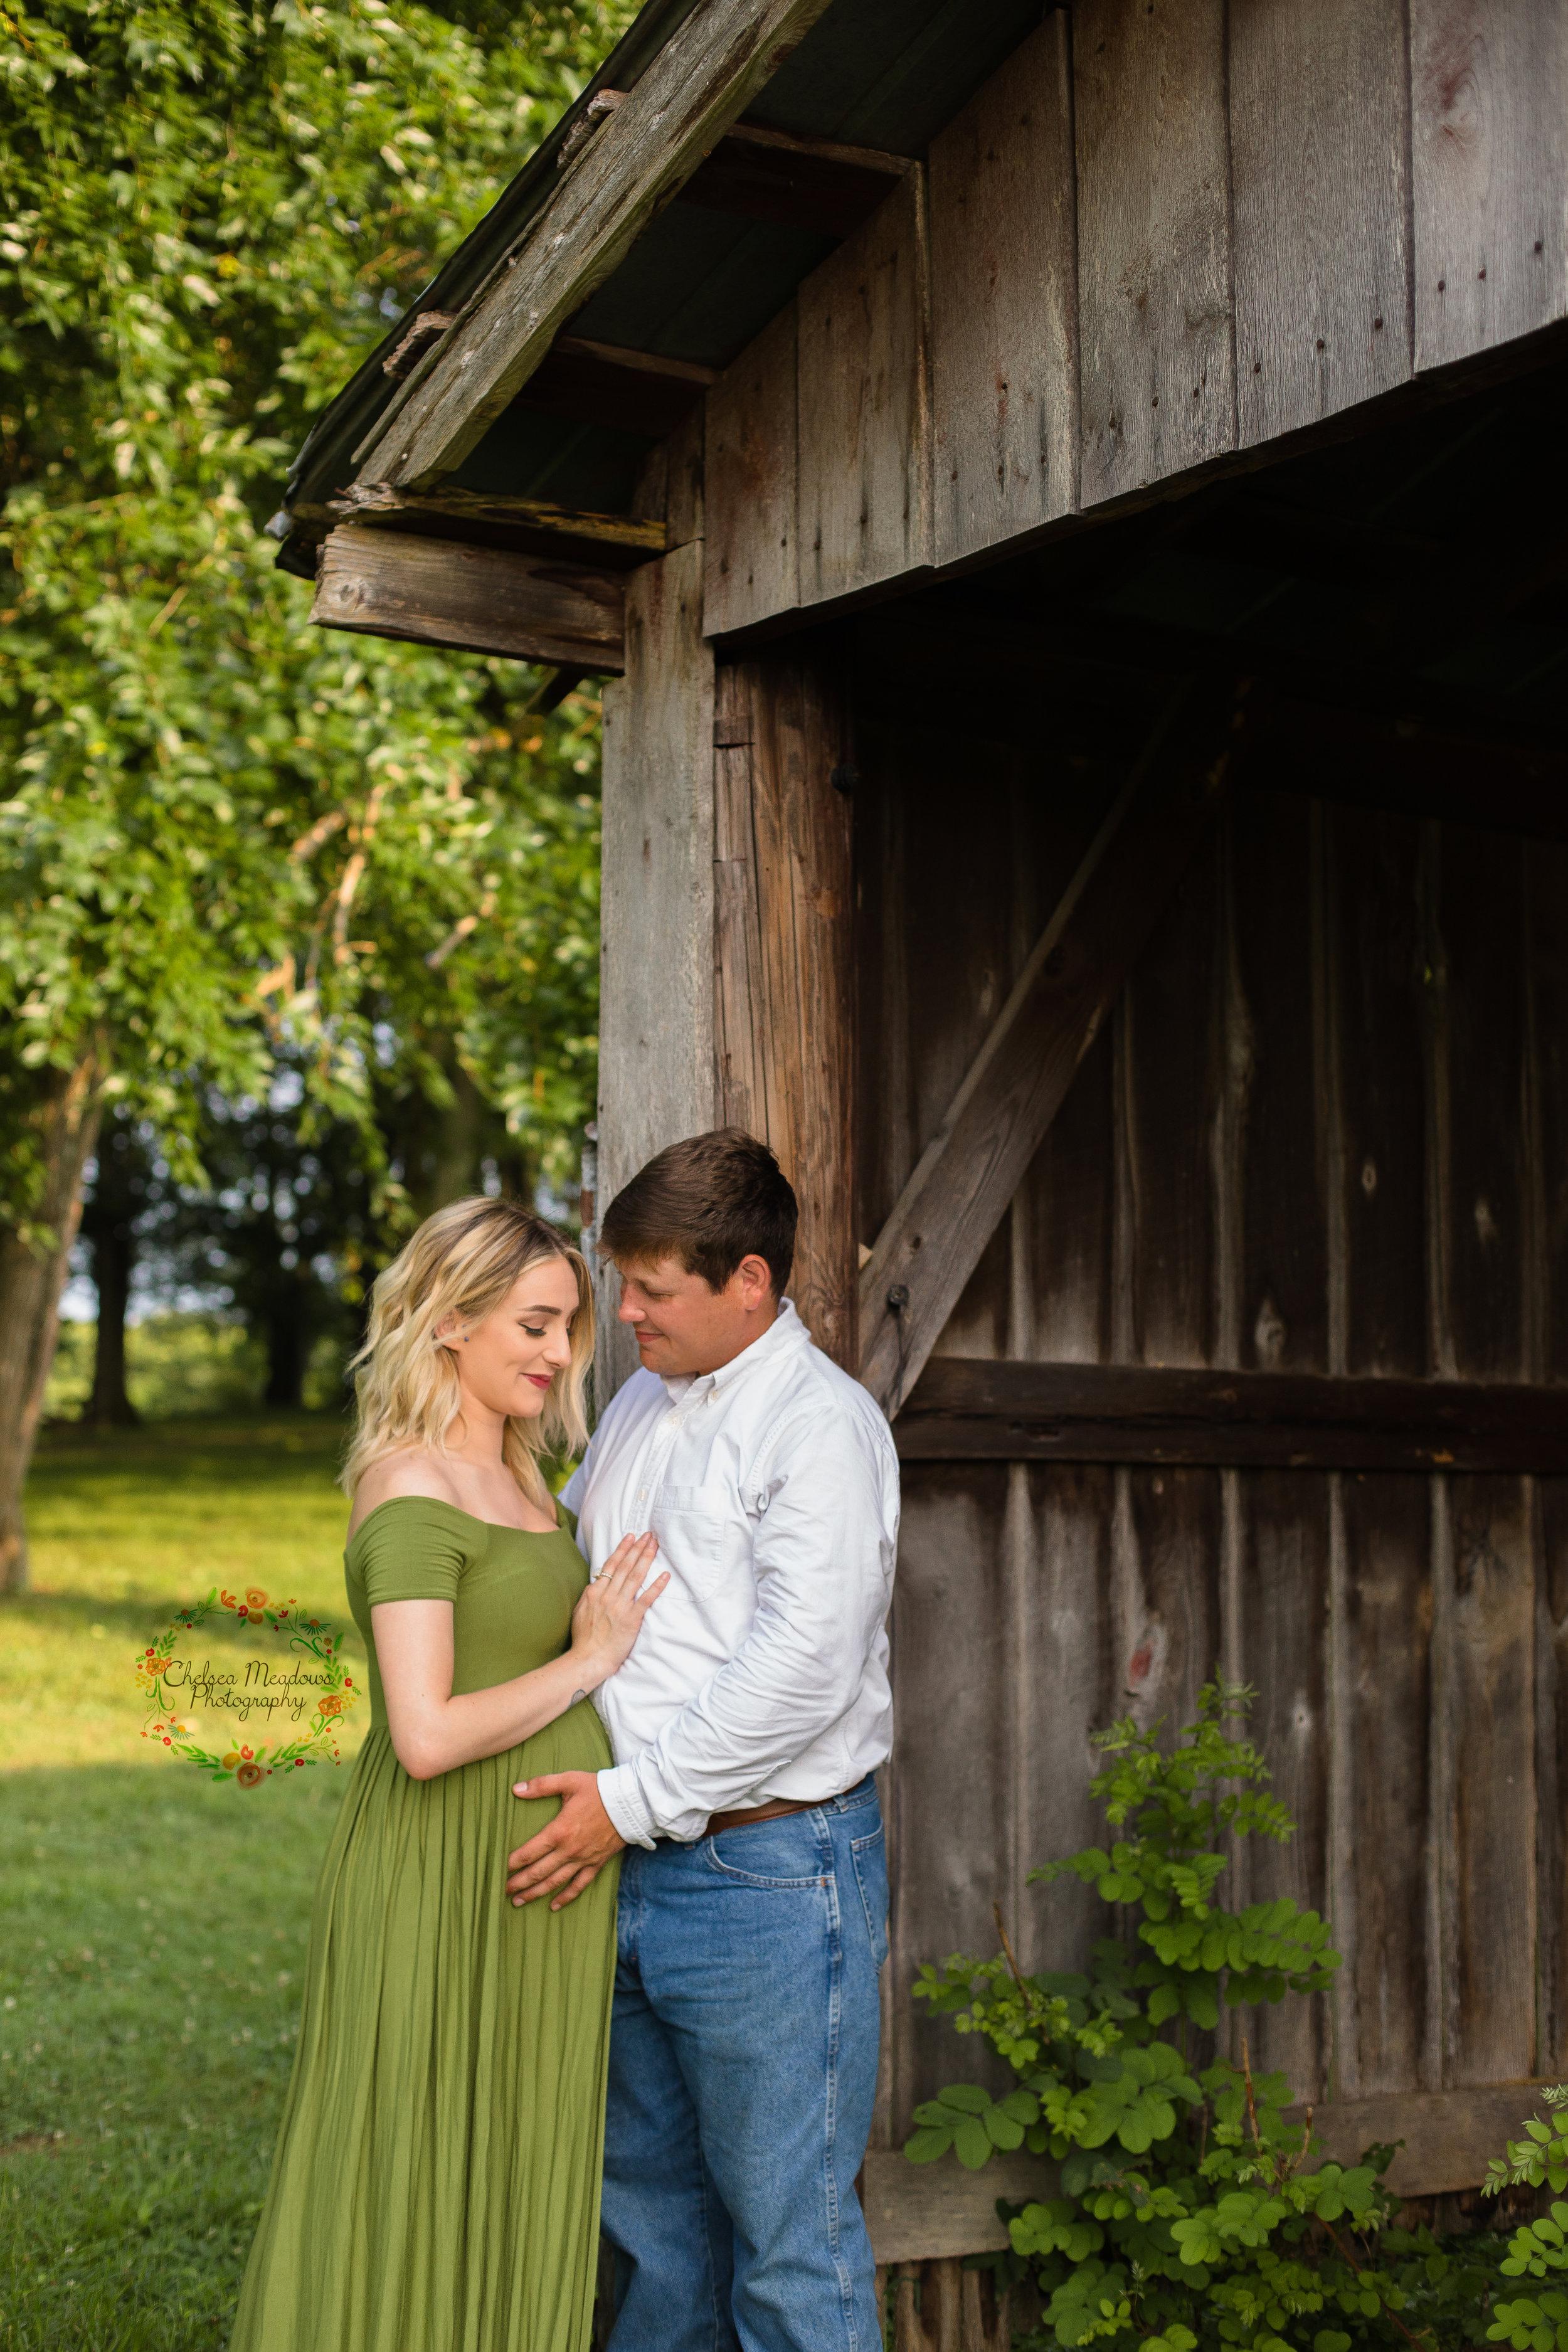 Maya Costanza Maternity - Nashville Maternity Photographer - Chelsea Meadows Photography (106).jpg